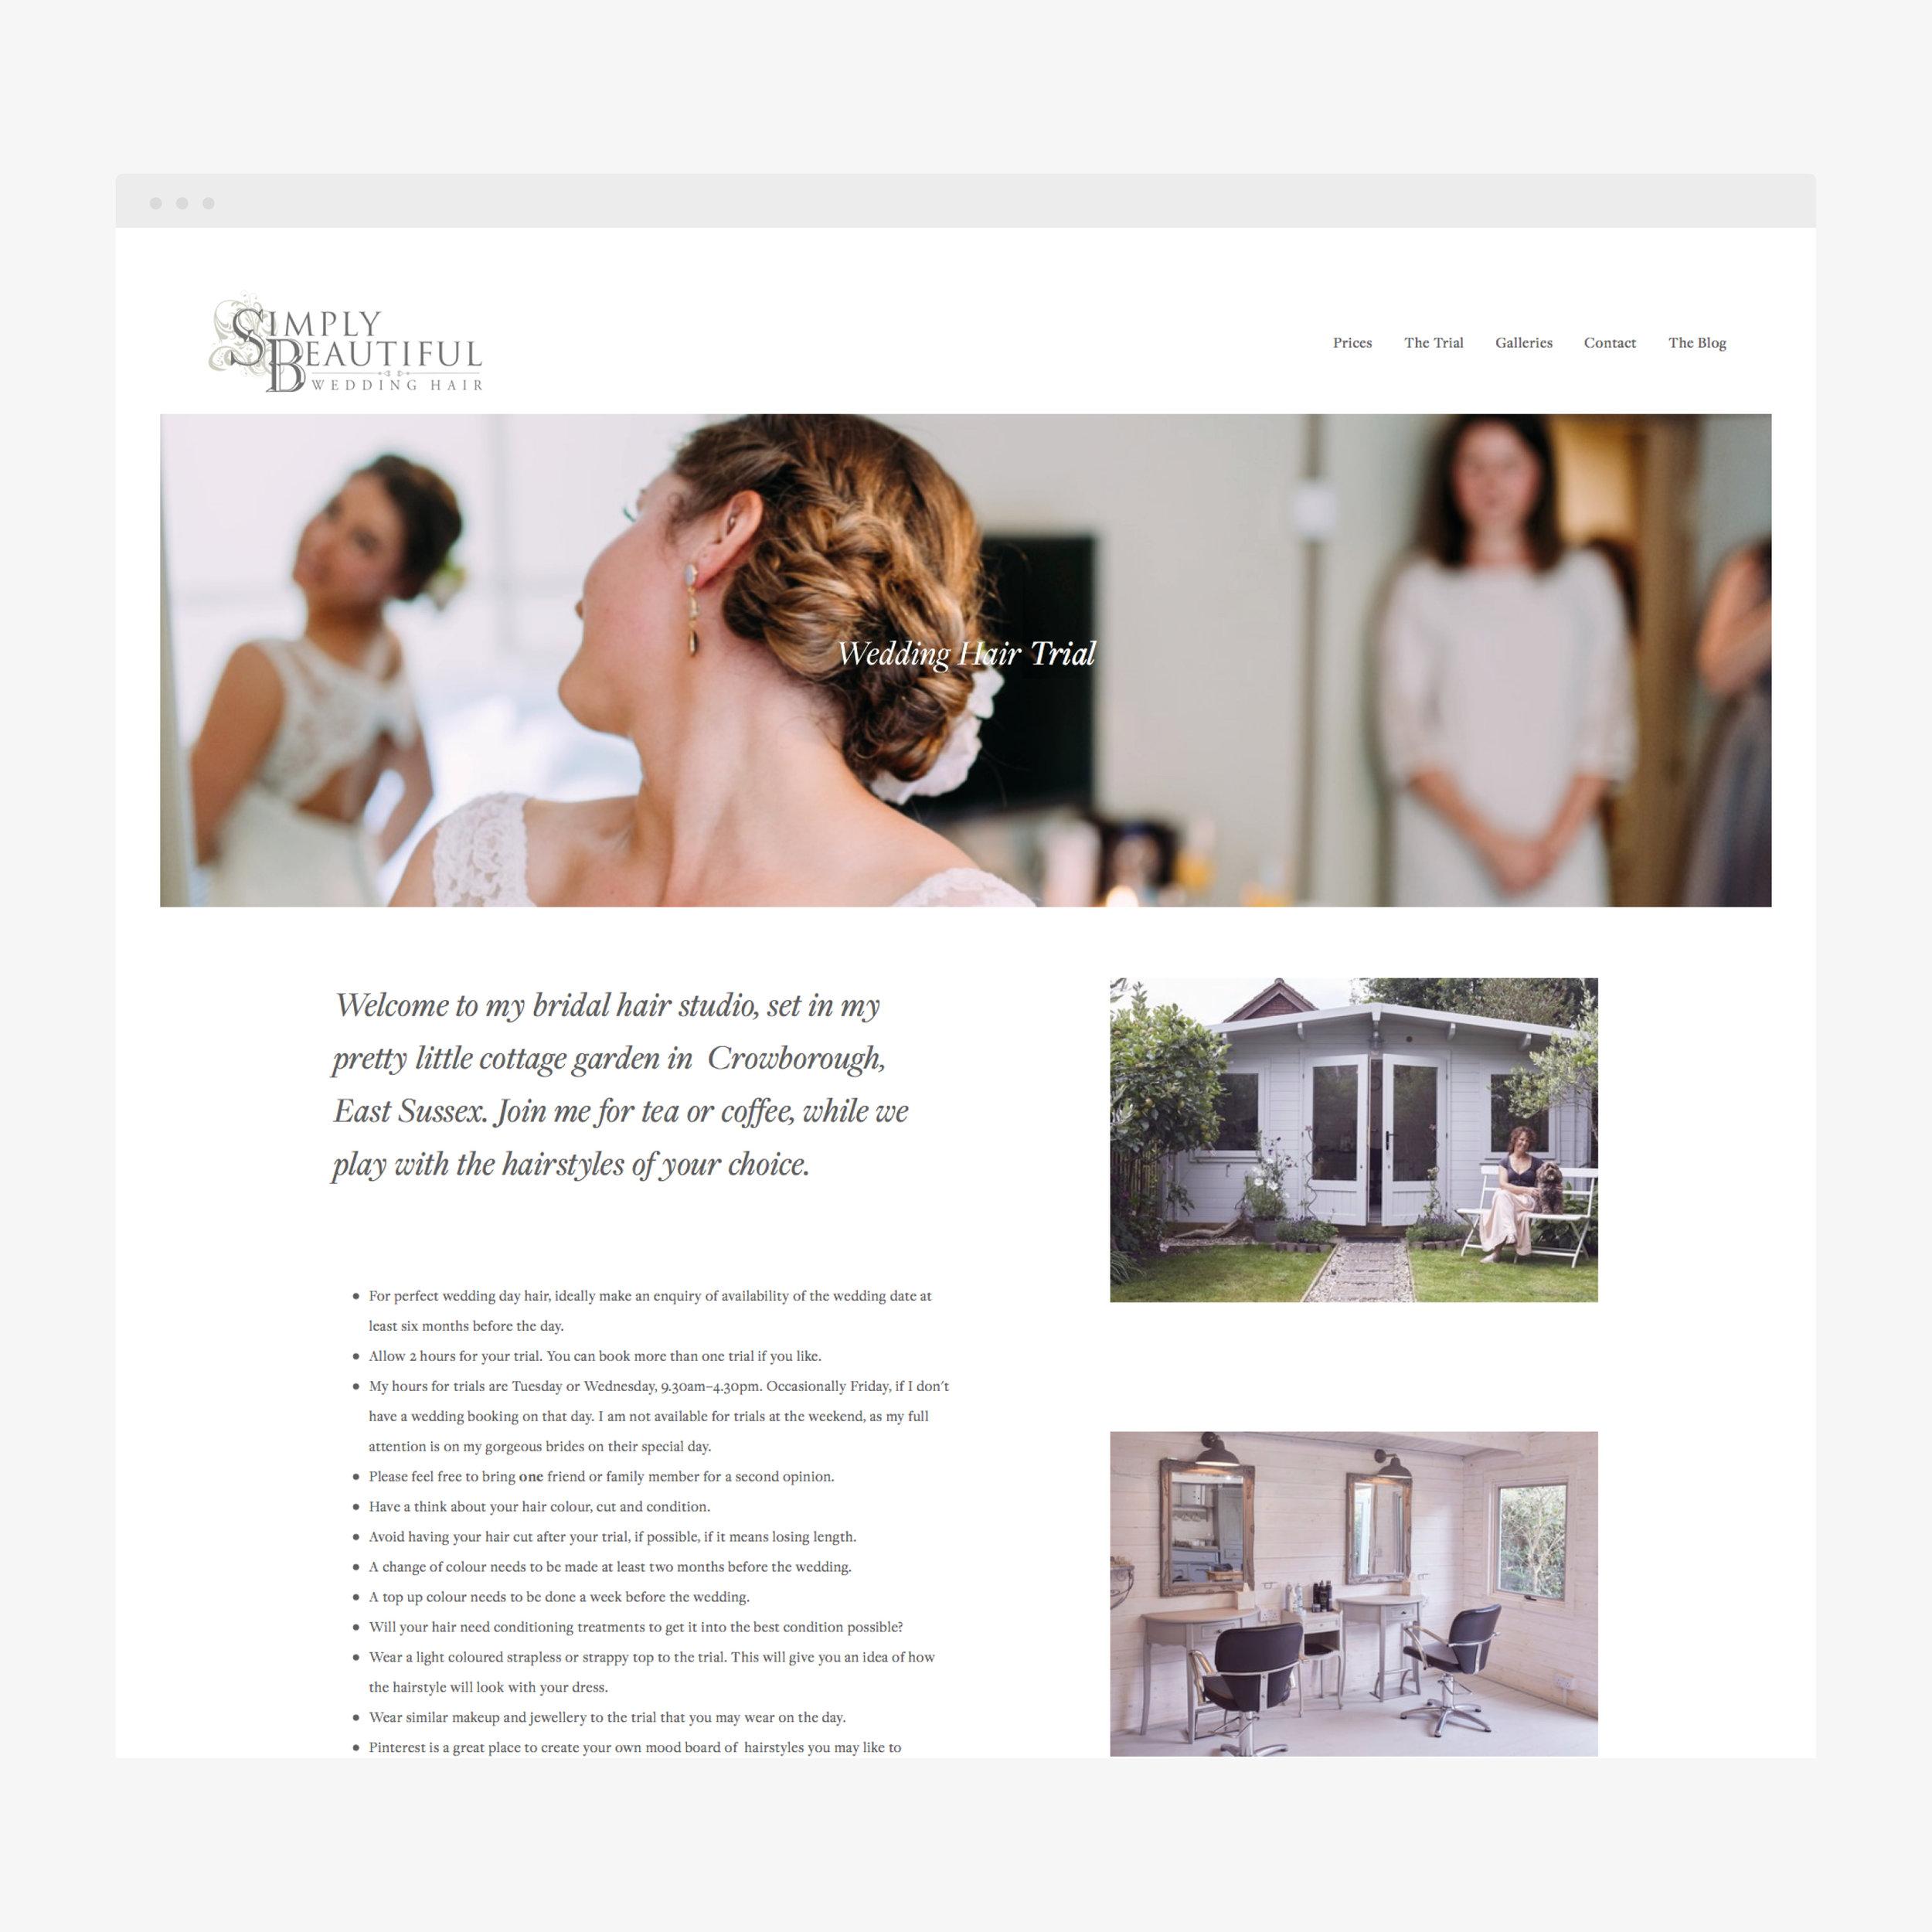 Website design for Simply Beautiful Wedding Hair, Web designer Crowborough